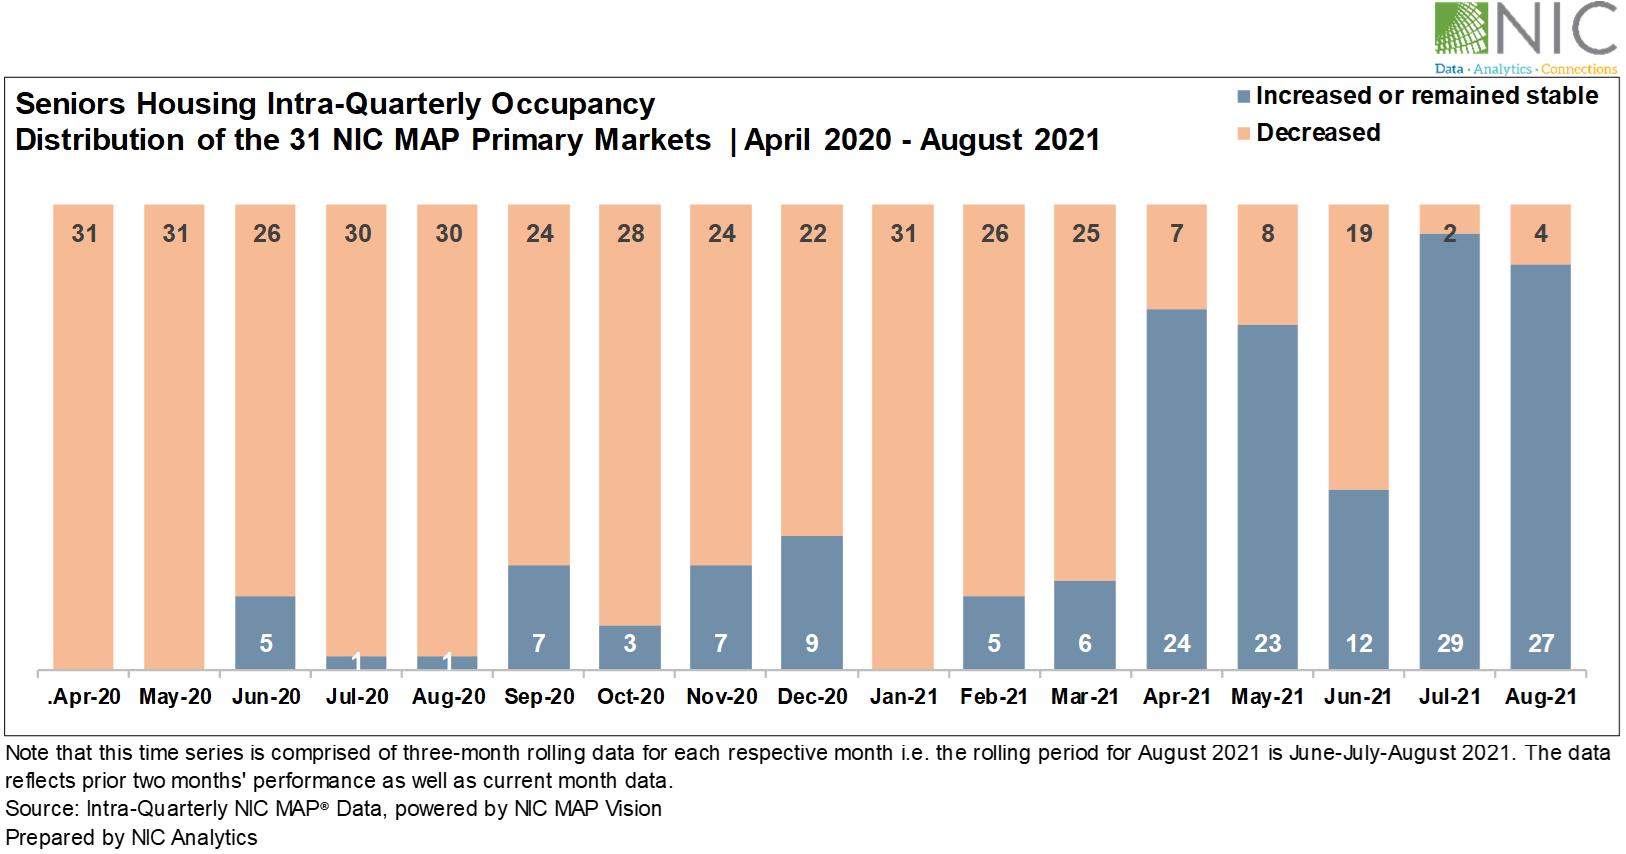 Senior Housing Intra-Quarterly Occupancy Aug 2021